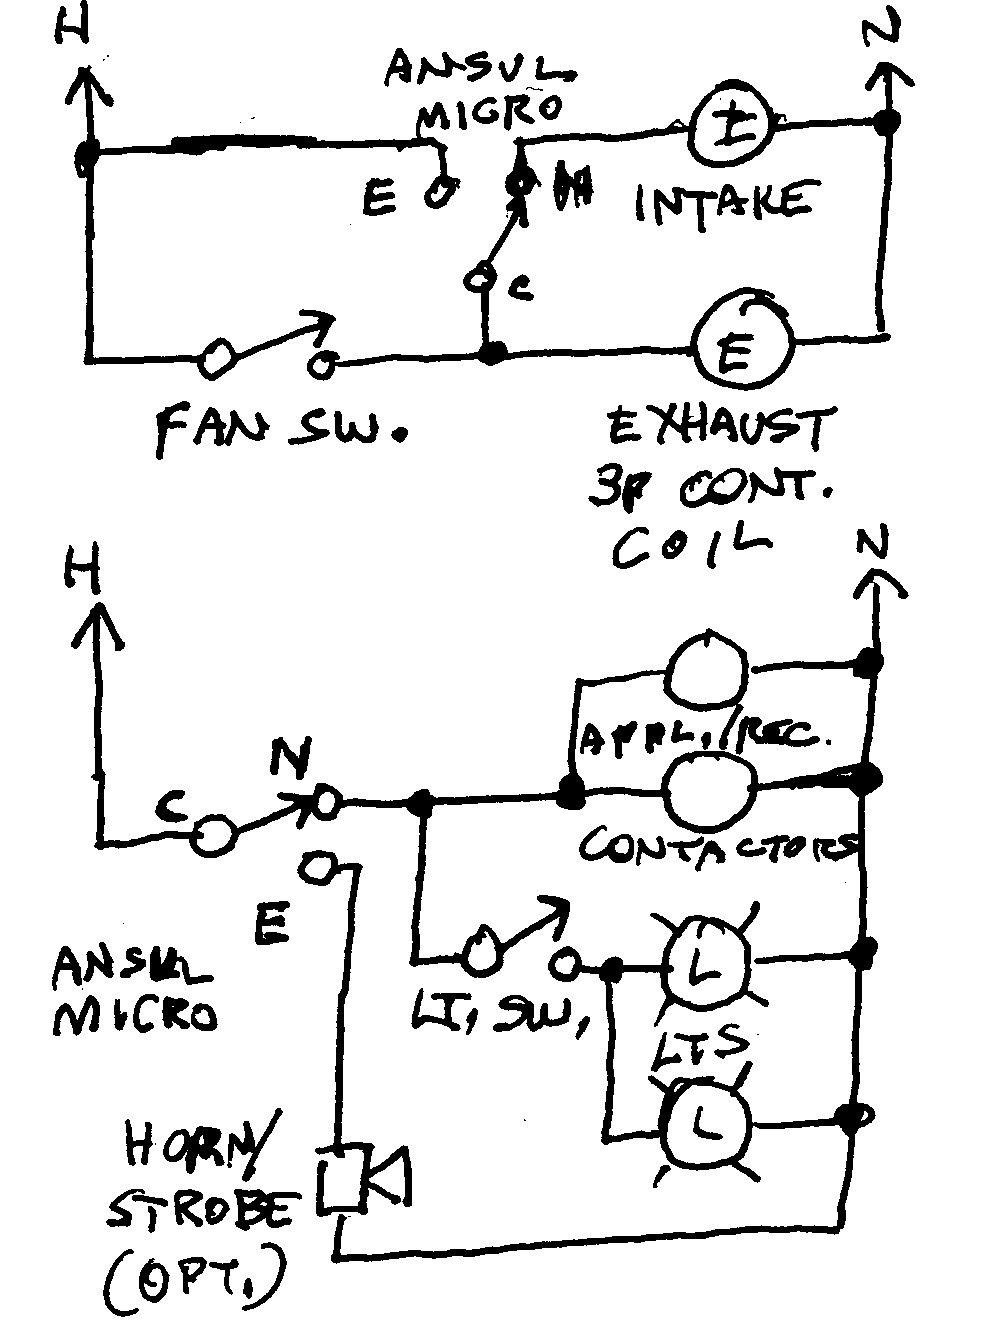 shunt trip breaker wiring diagram for hood 2004 jeep grand cherokee door ansul system - electrical contractor talk